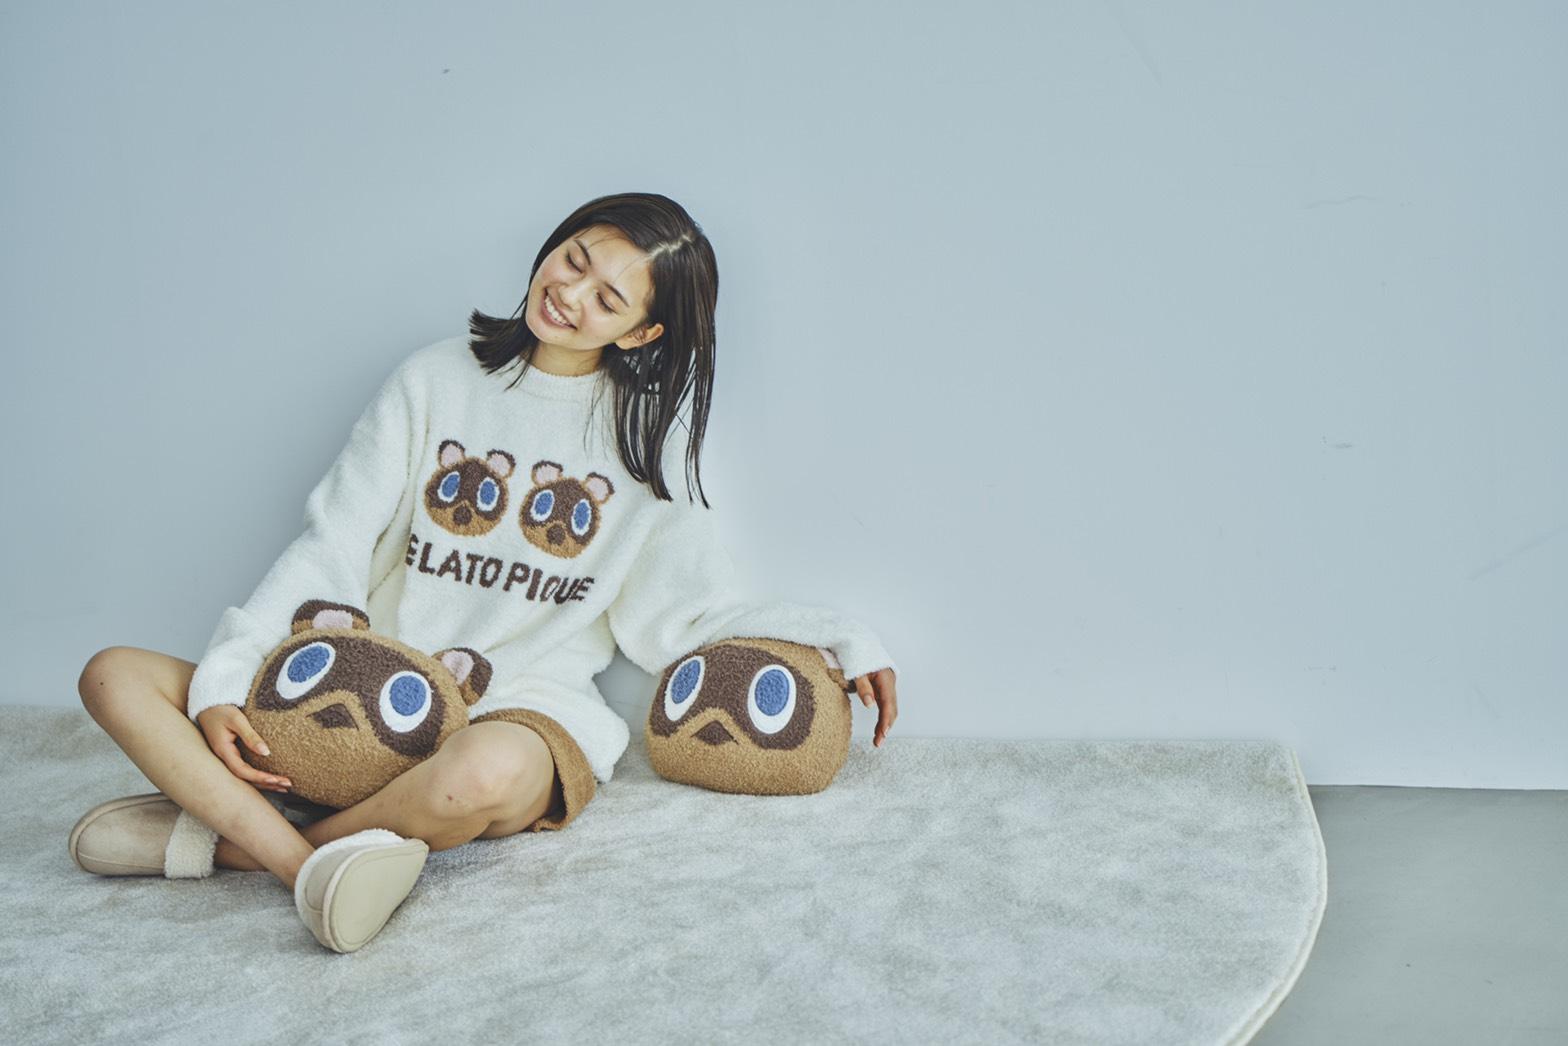 Animal Crossing Gelato Pique loungewear